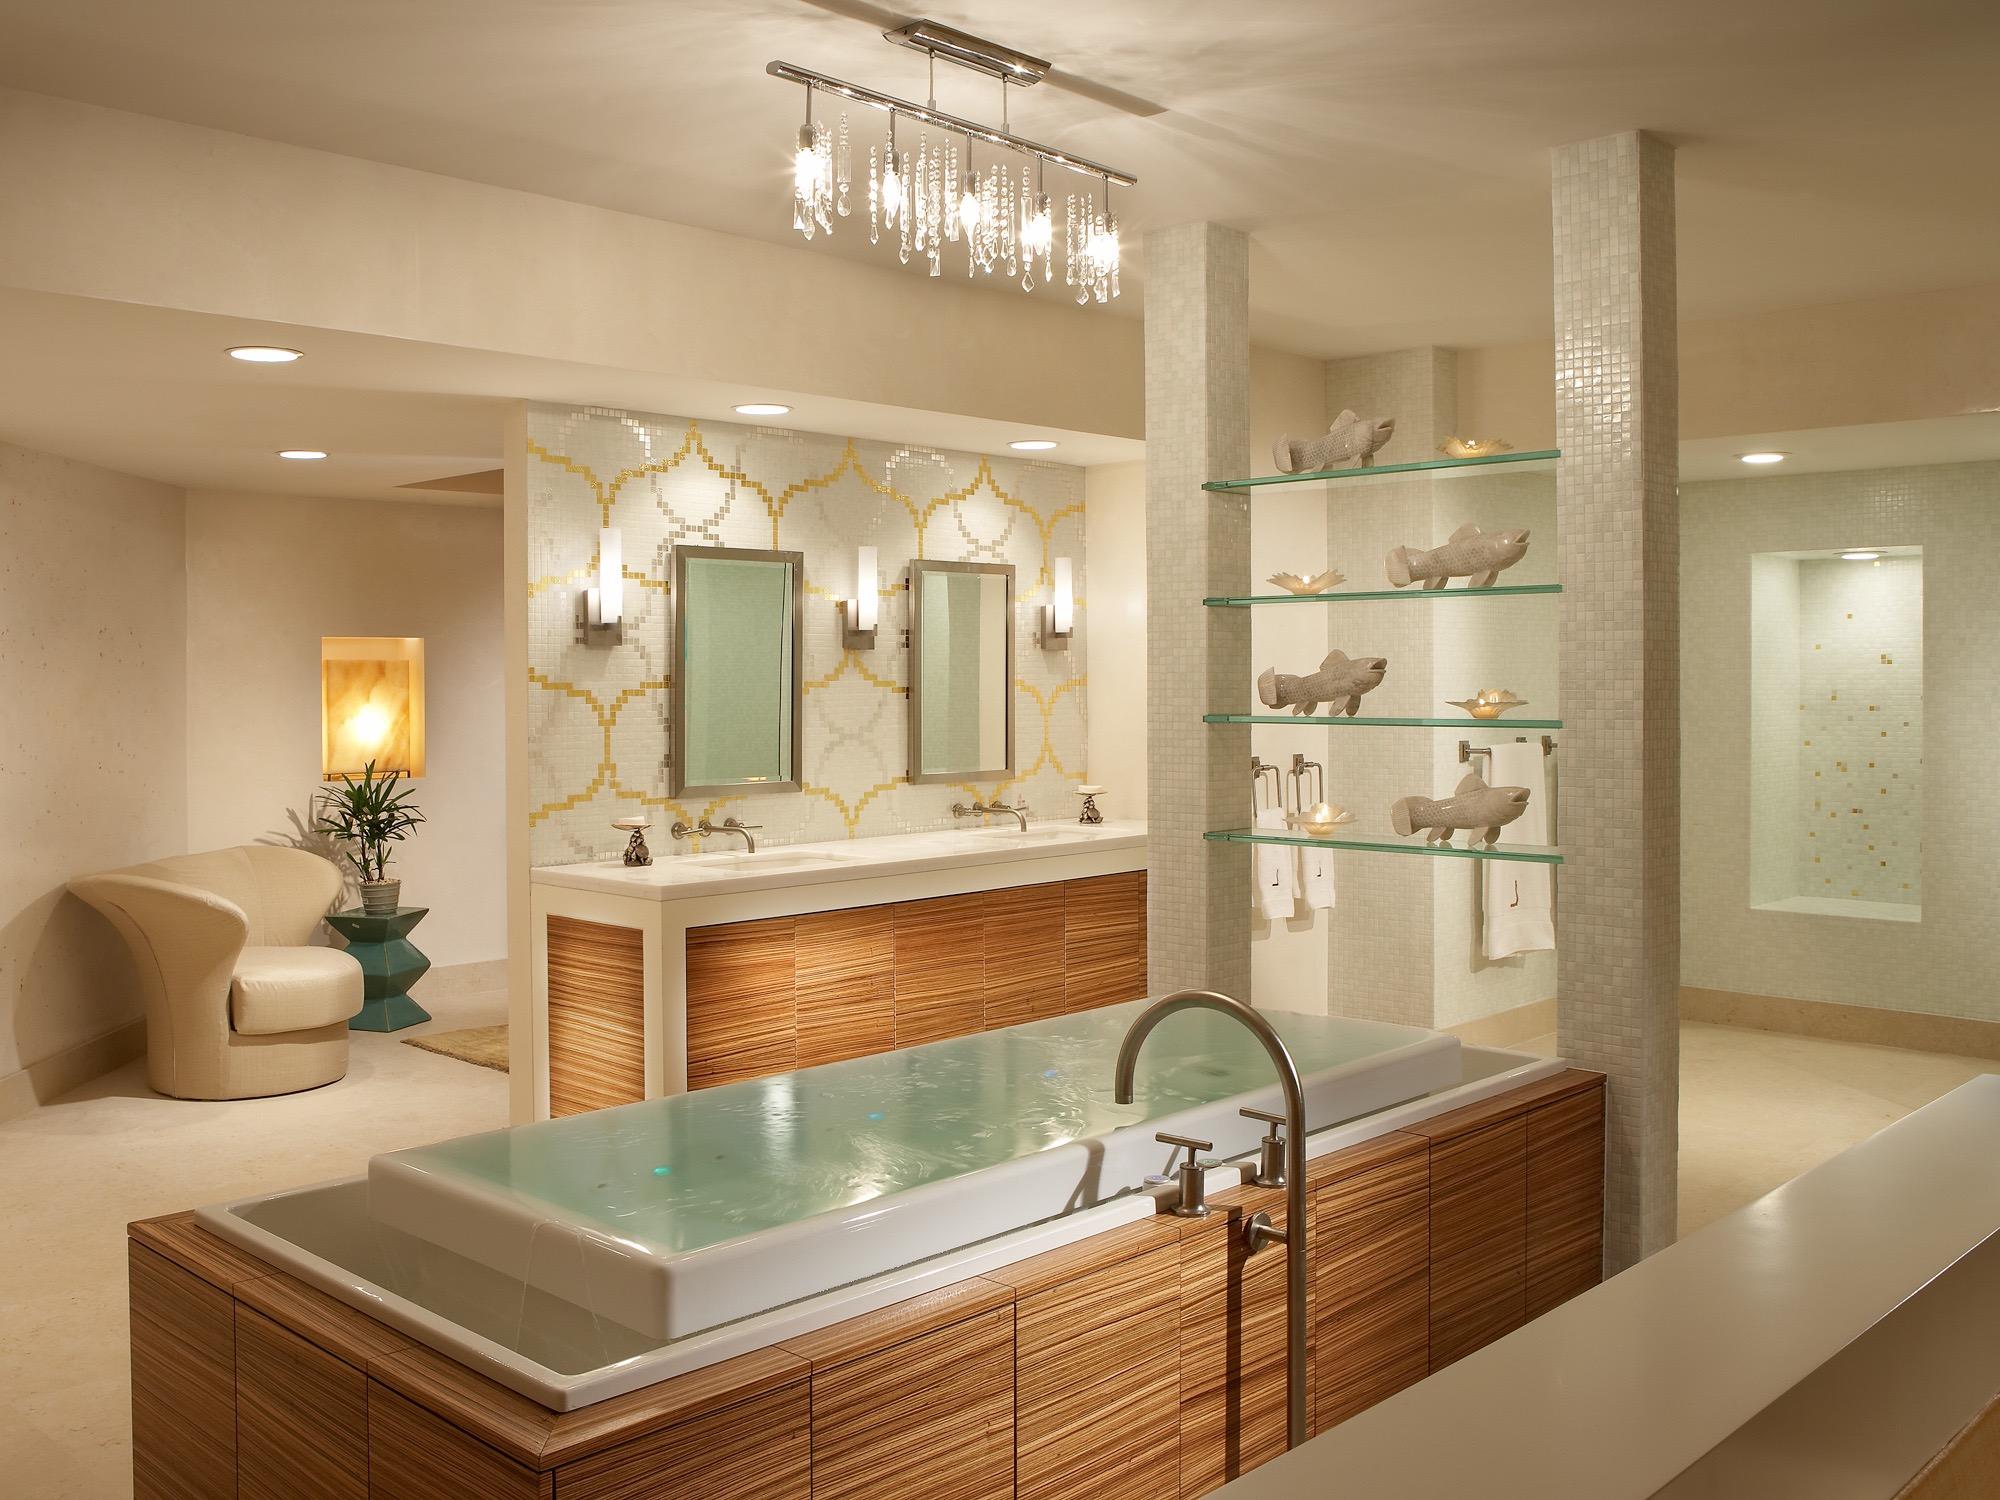 Deluxe Modern Bathroom Interior Ideas 688 House